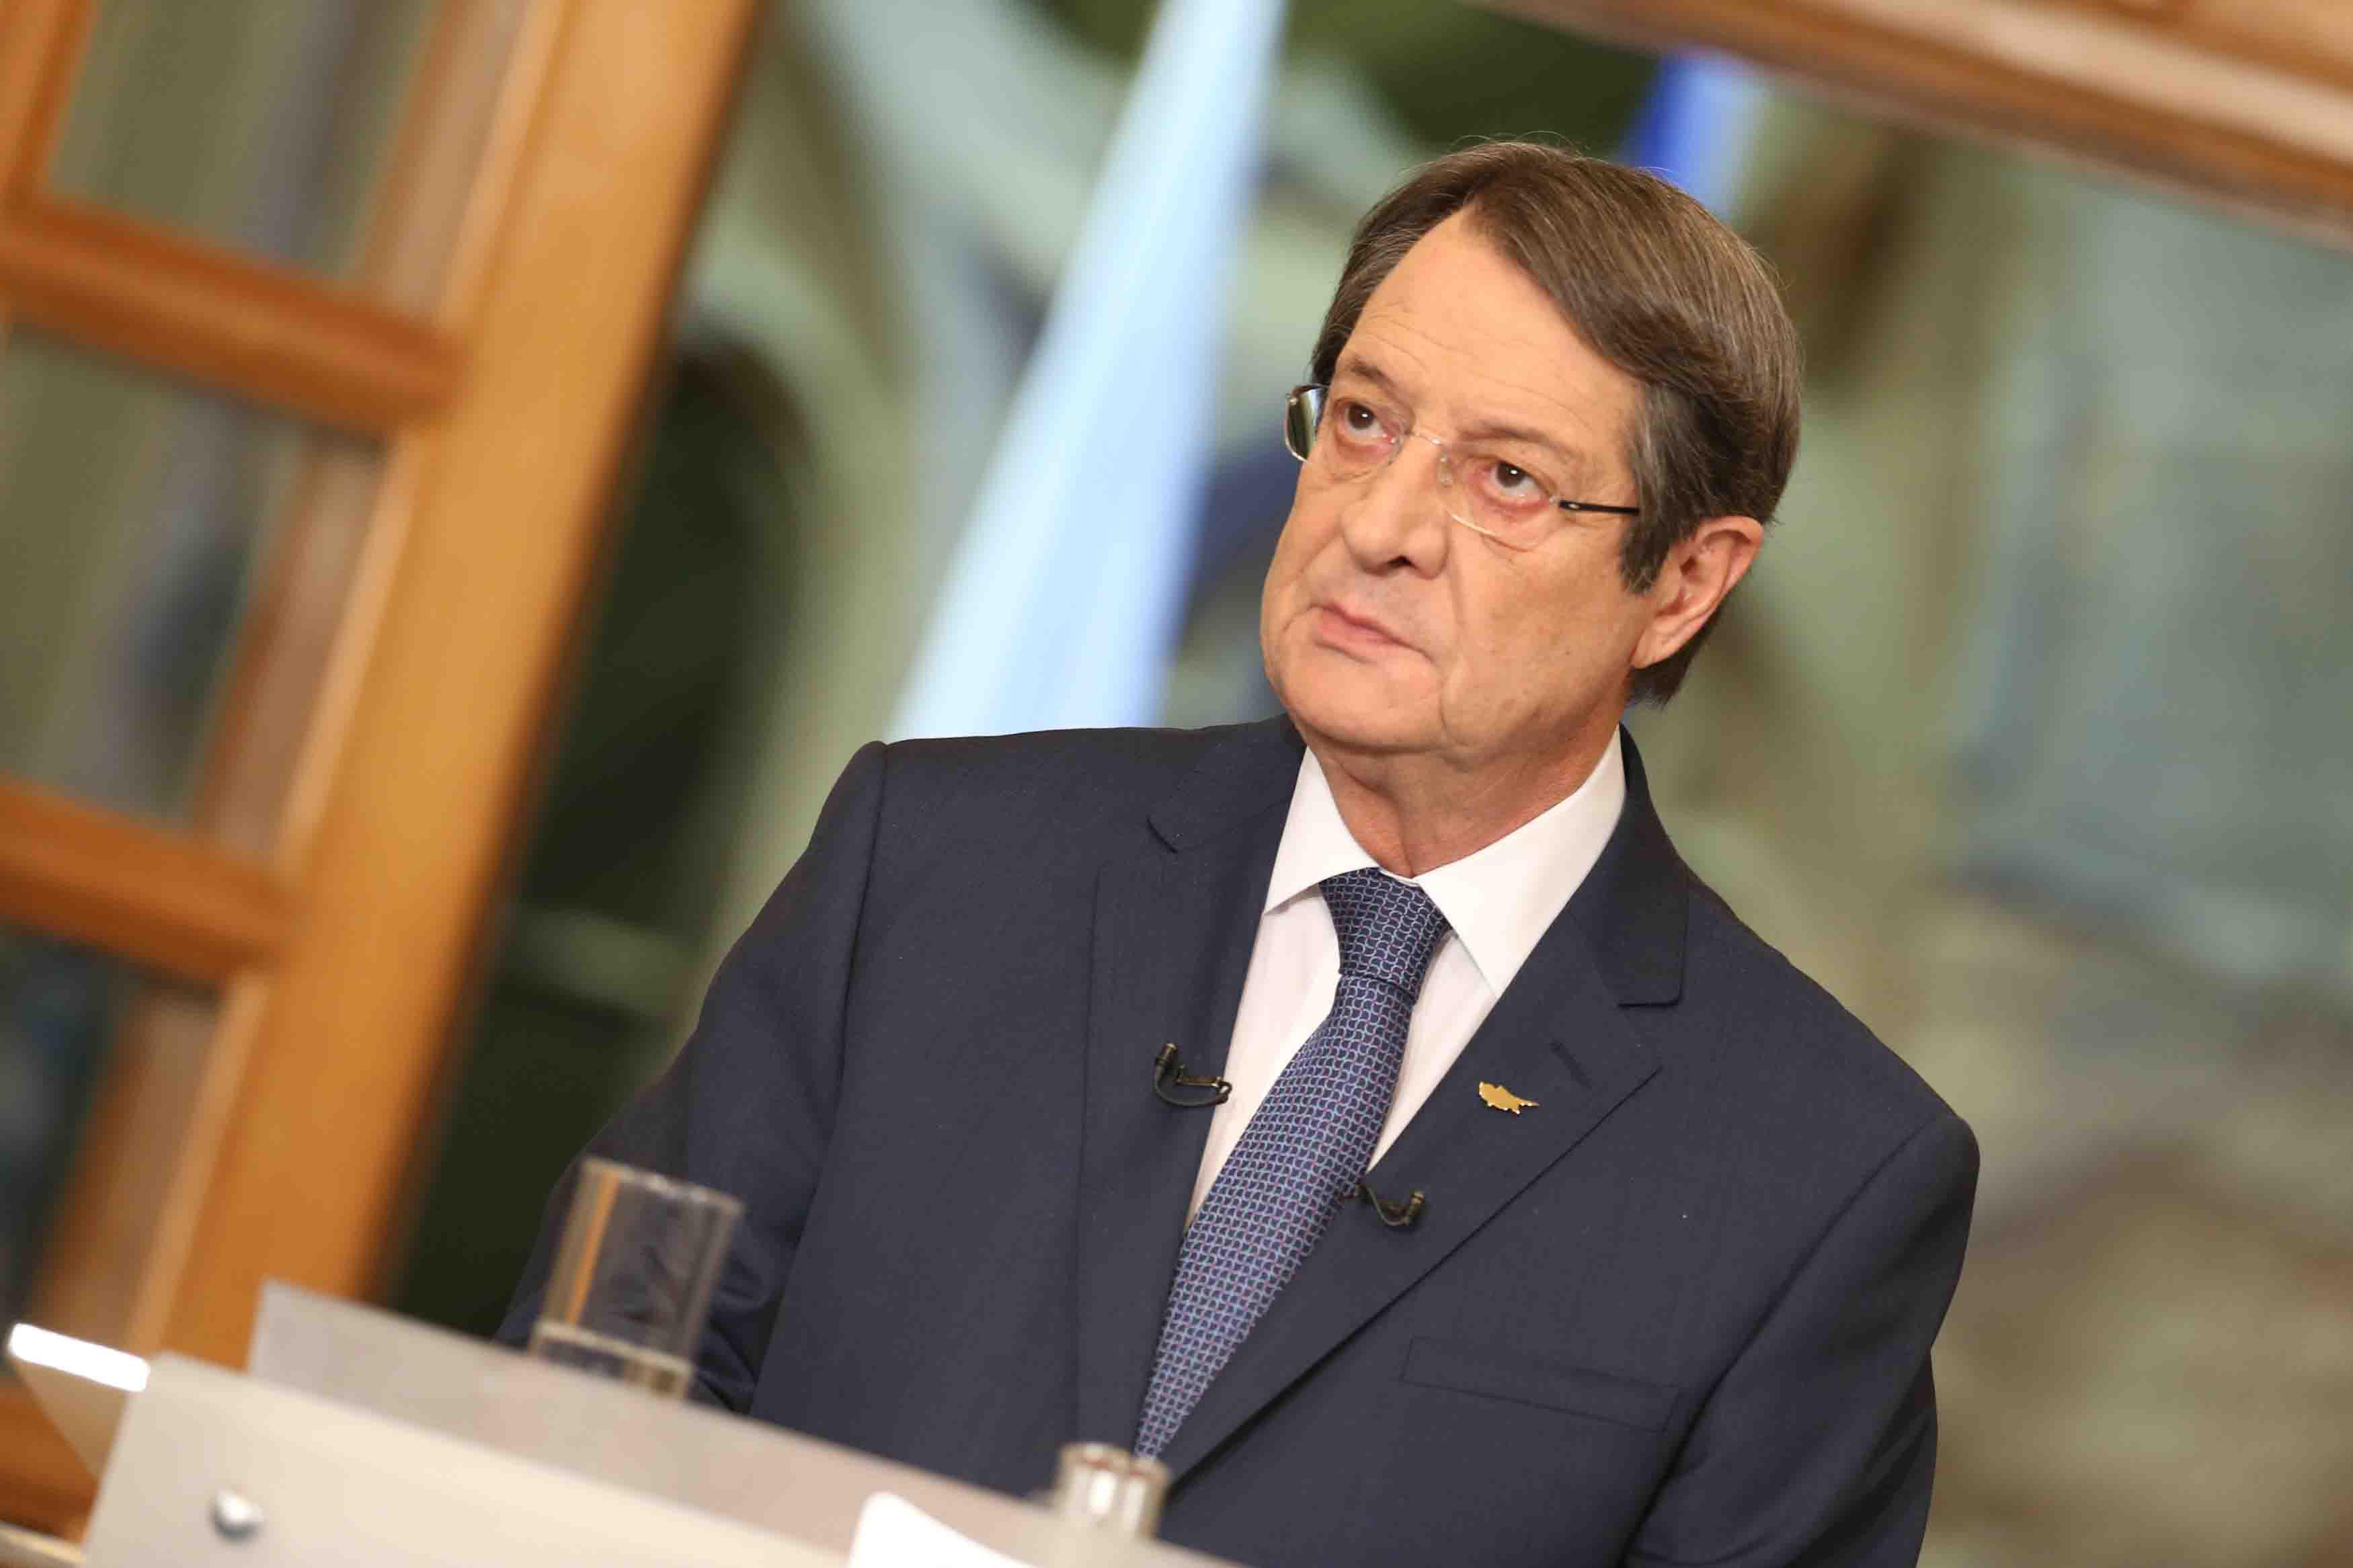 Predsednik Anastasiades kiparskim Turcima predstavlja kontra predlog za prirodni gas